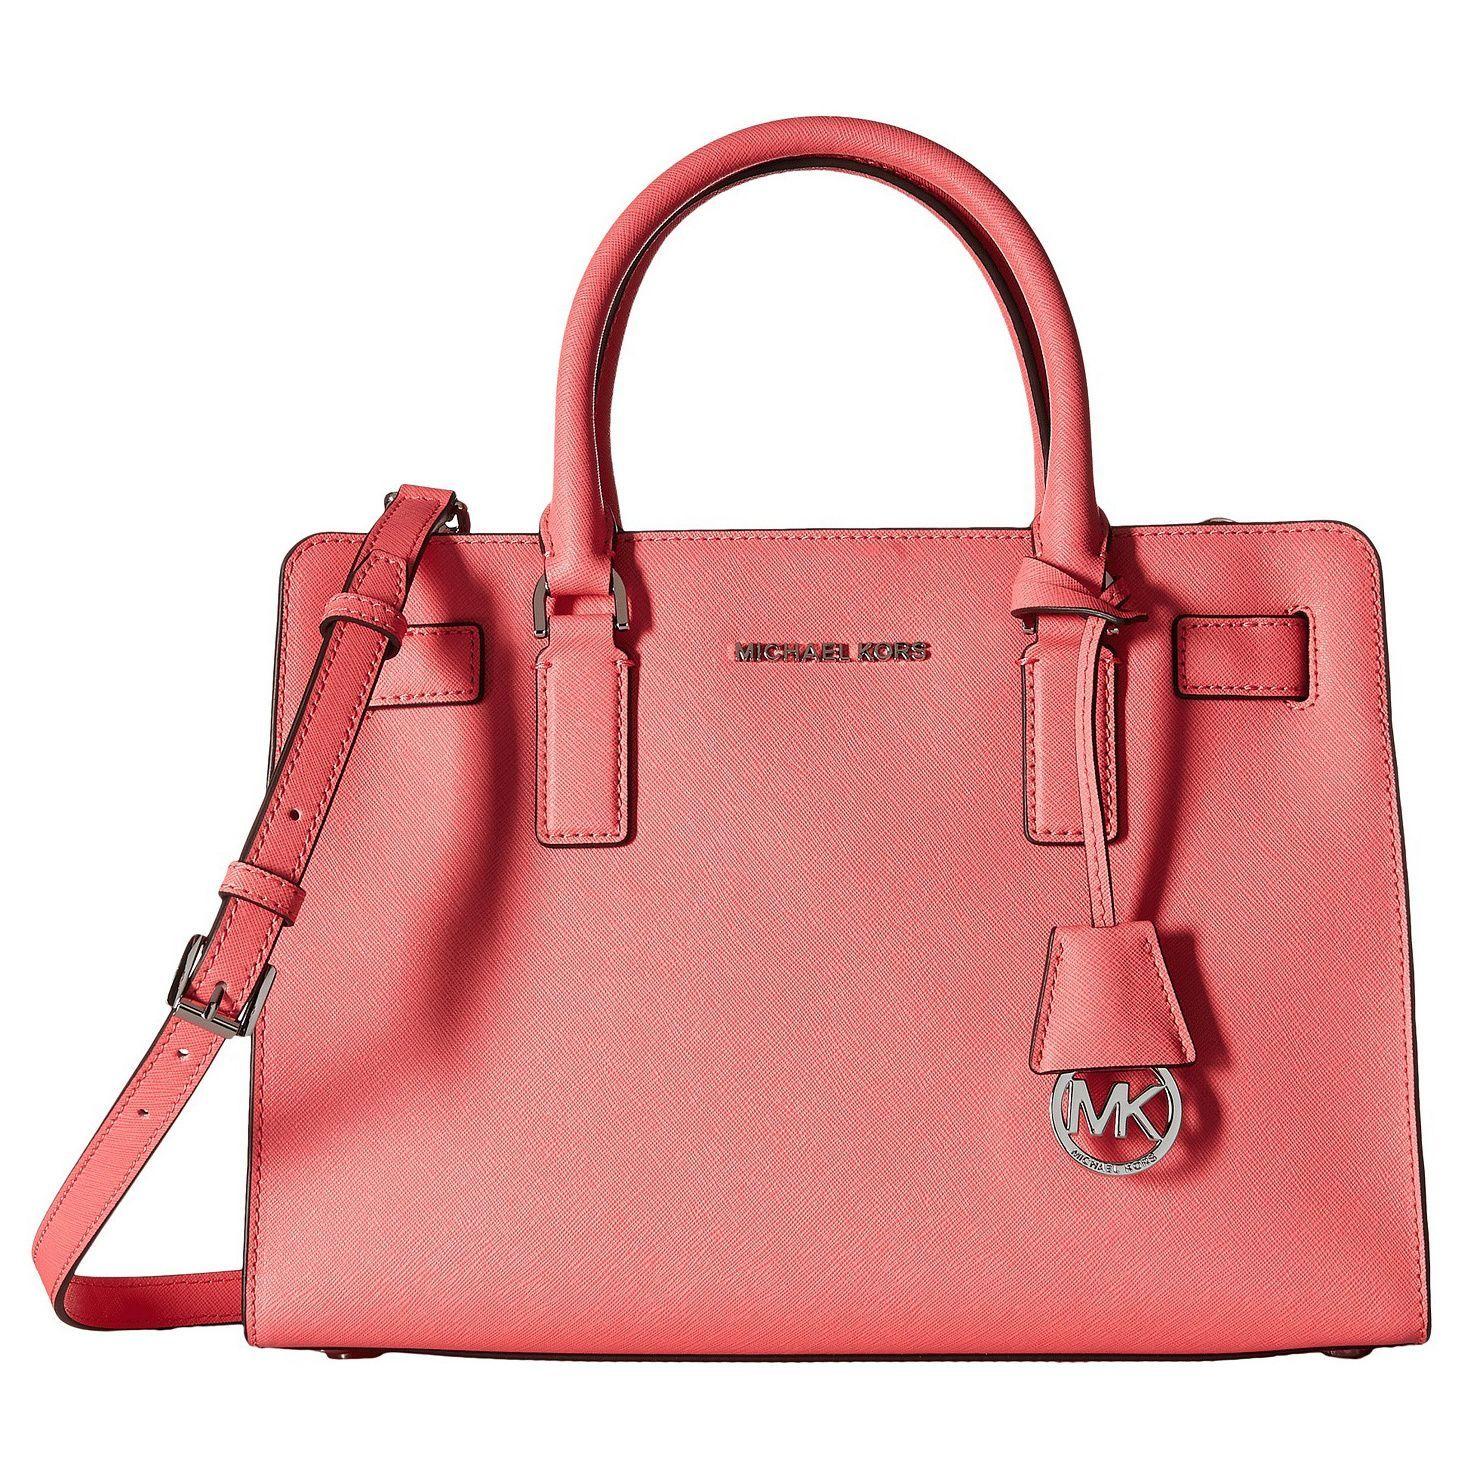 b3ef4fa3553b Michael Kors Dillon Coral East/West Satchel Handbag | Products ...